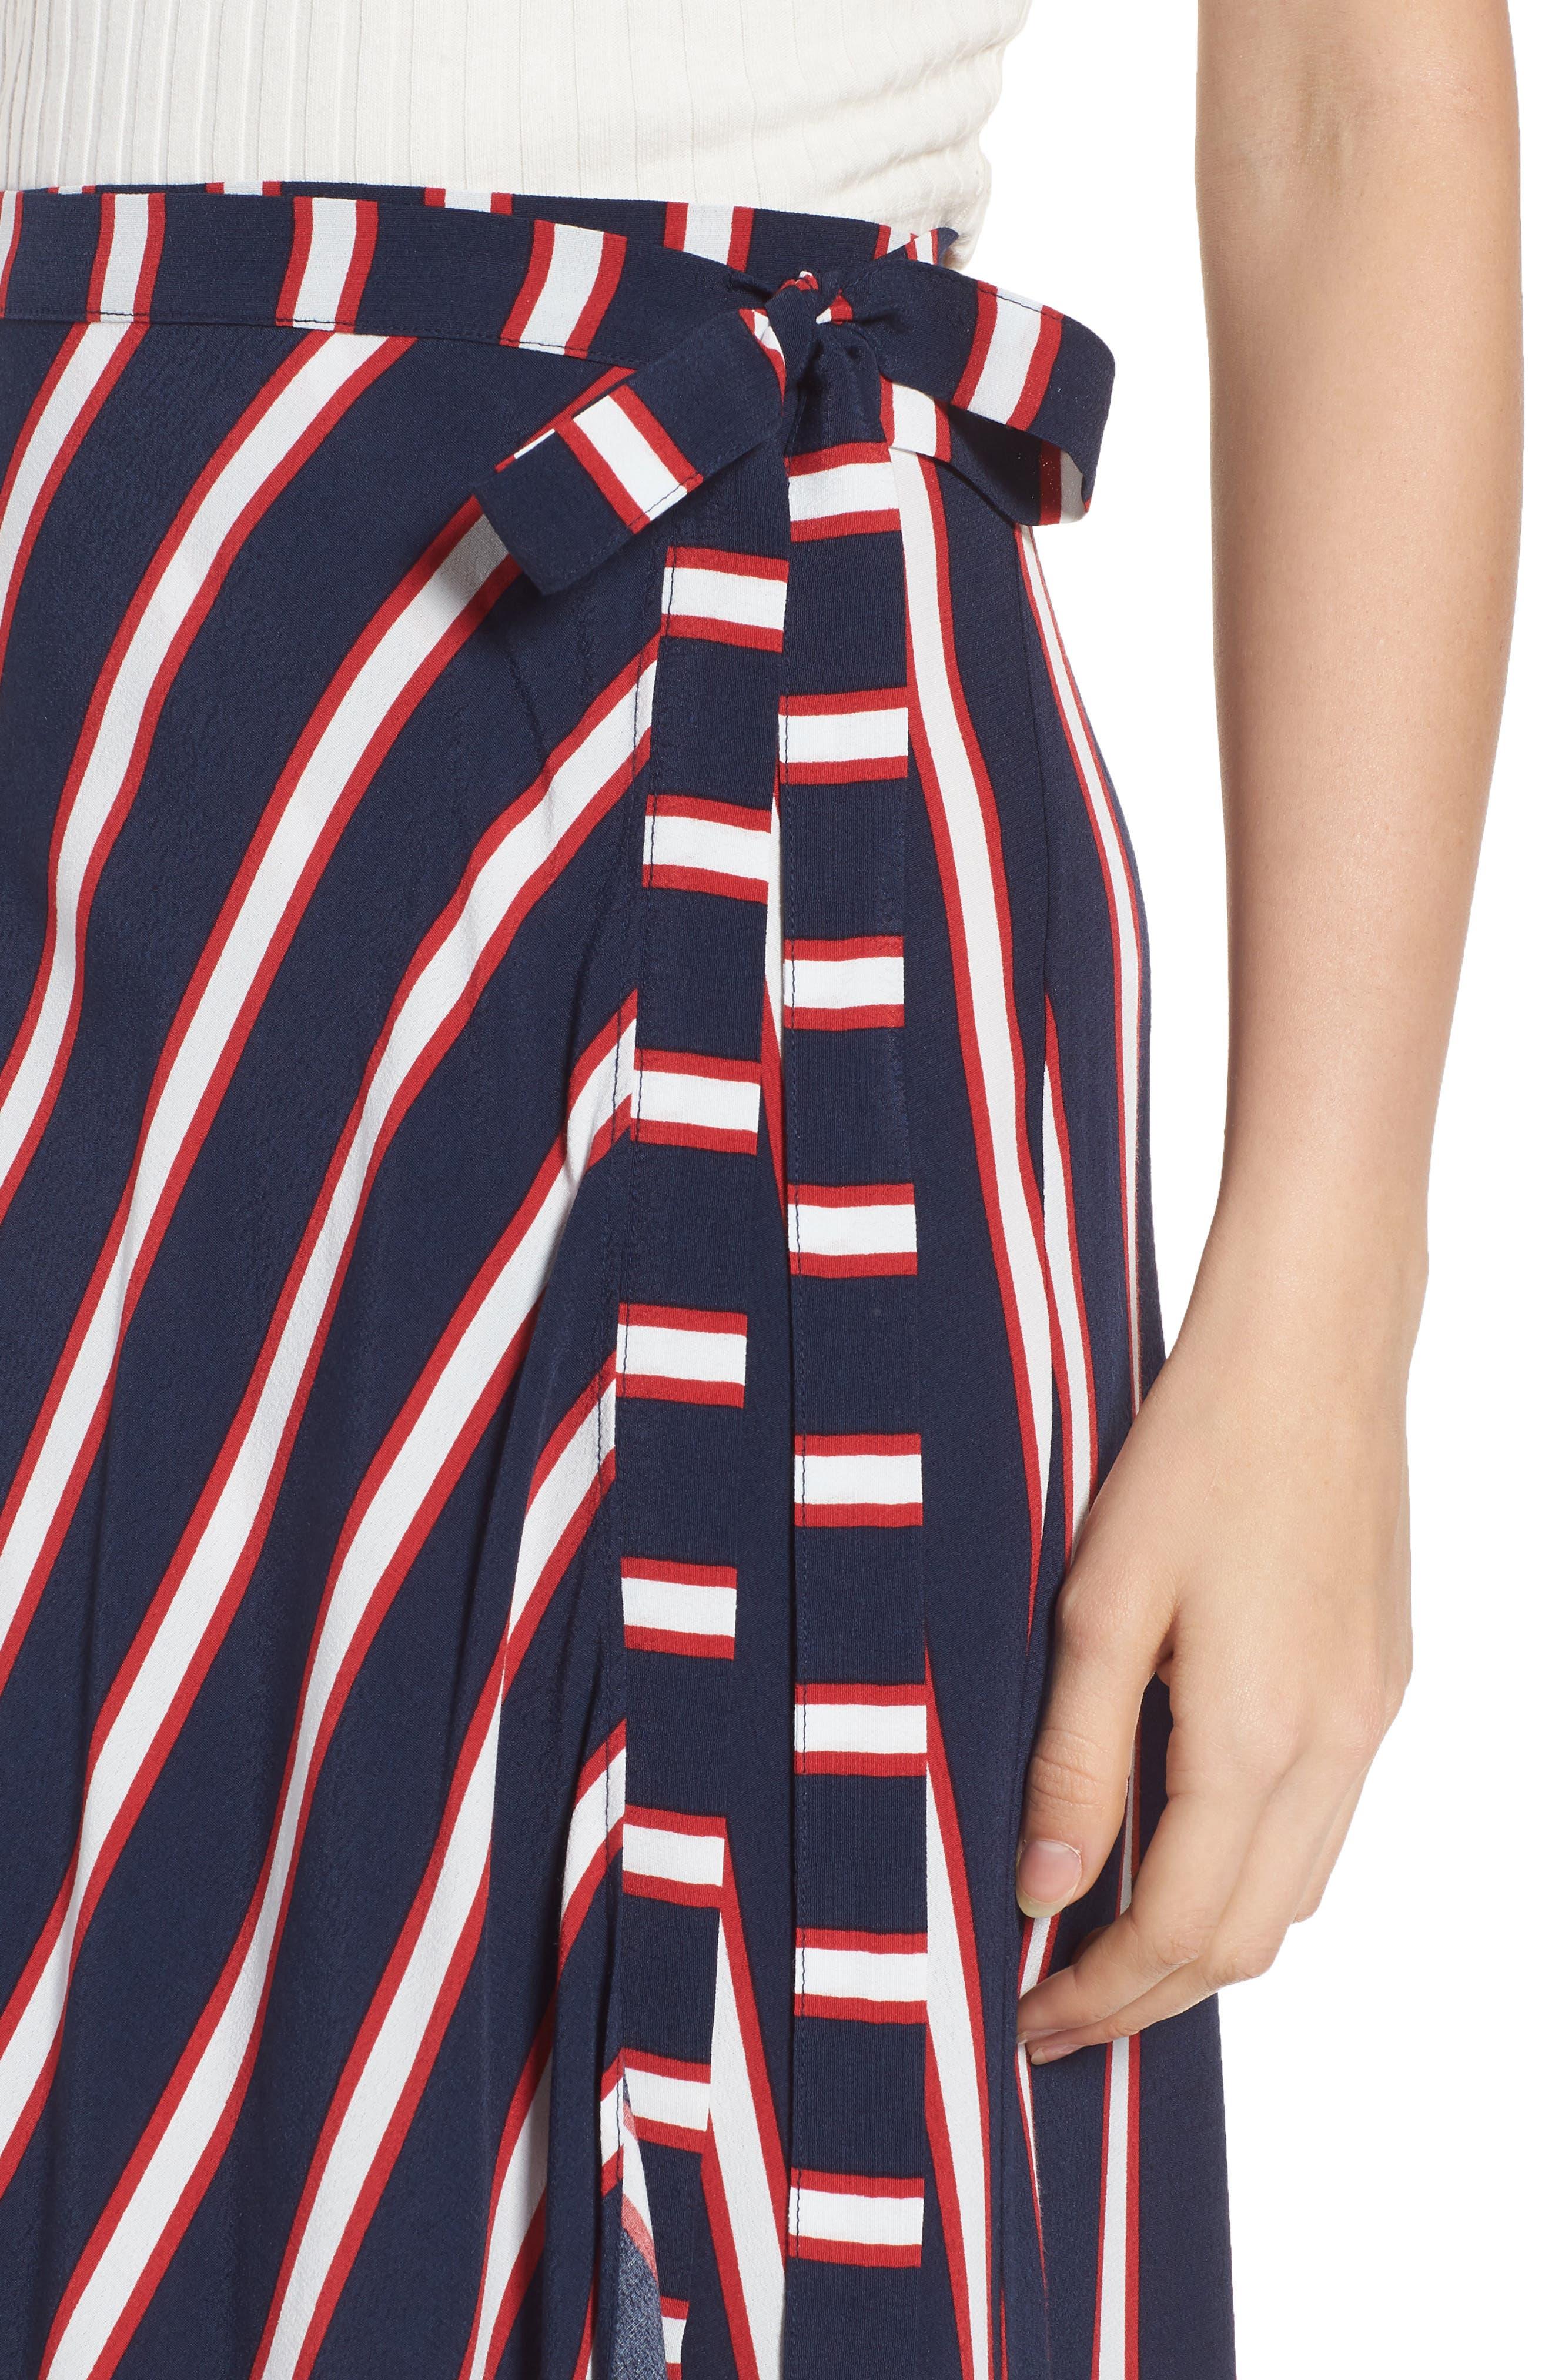 Stripe Midi Wrap Skirt,                             Alternate thumbnail 4, color,                             Navy Peacoat Awning Stripe